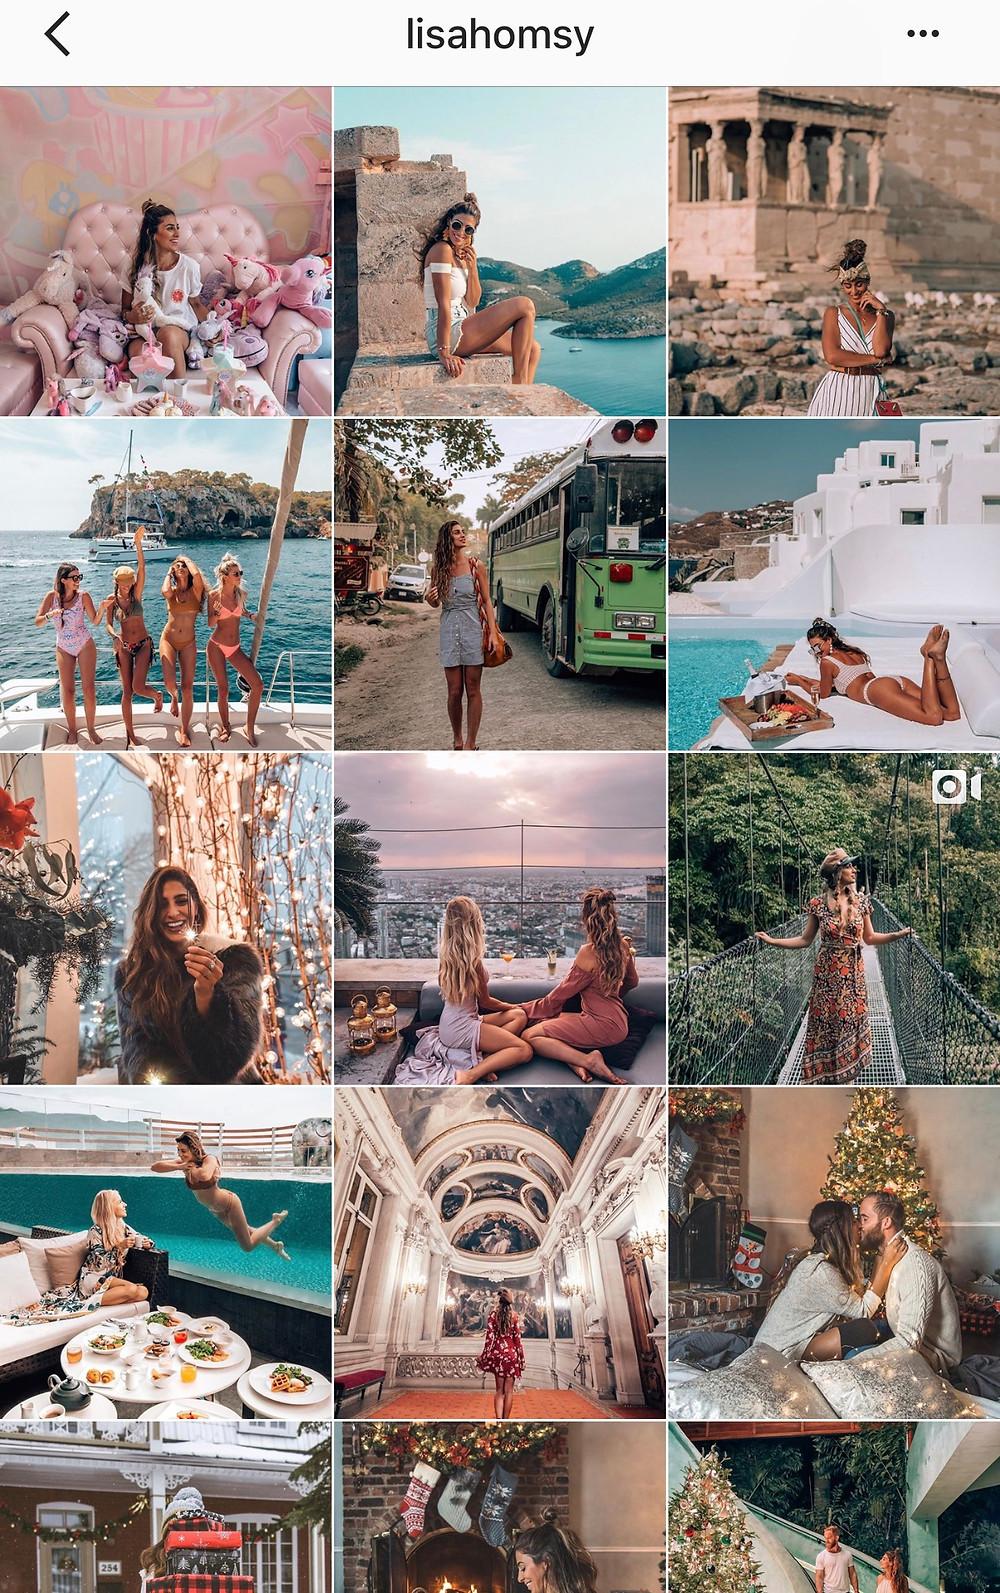 Lisahomsy sur Instagram